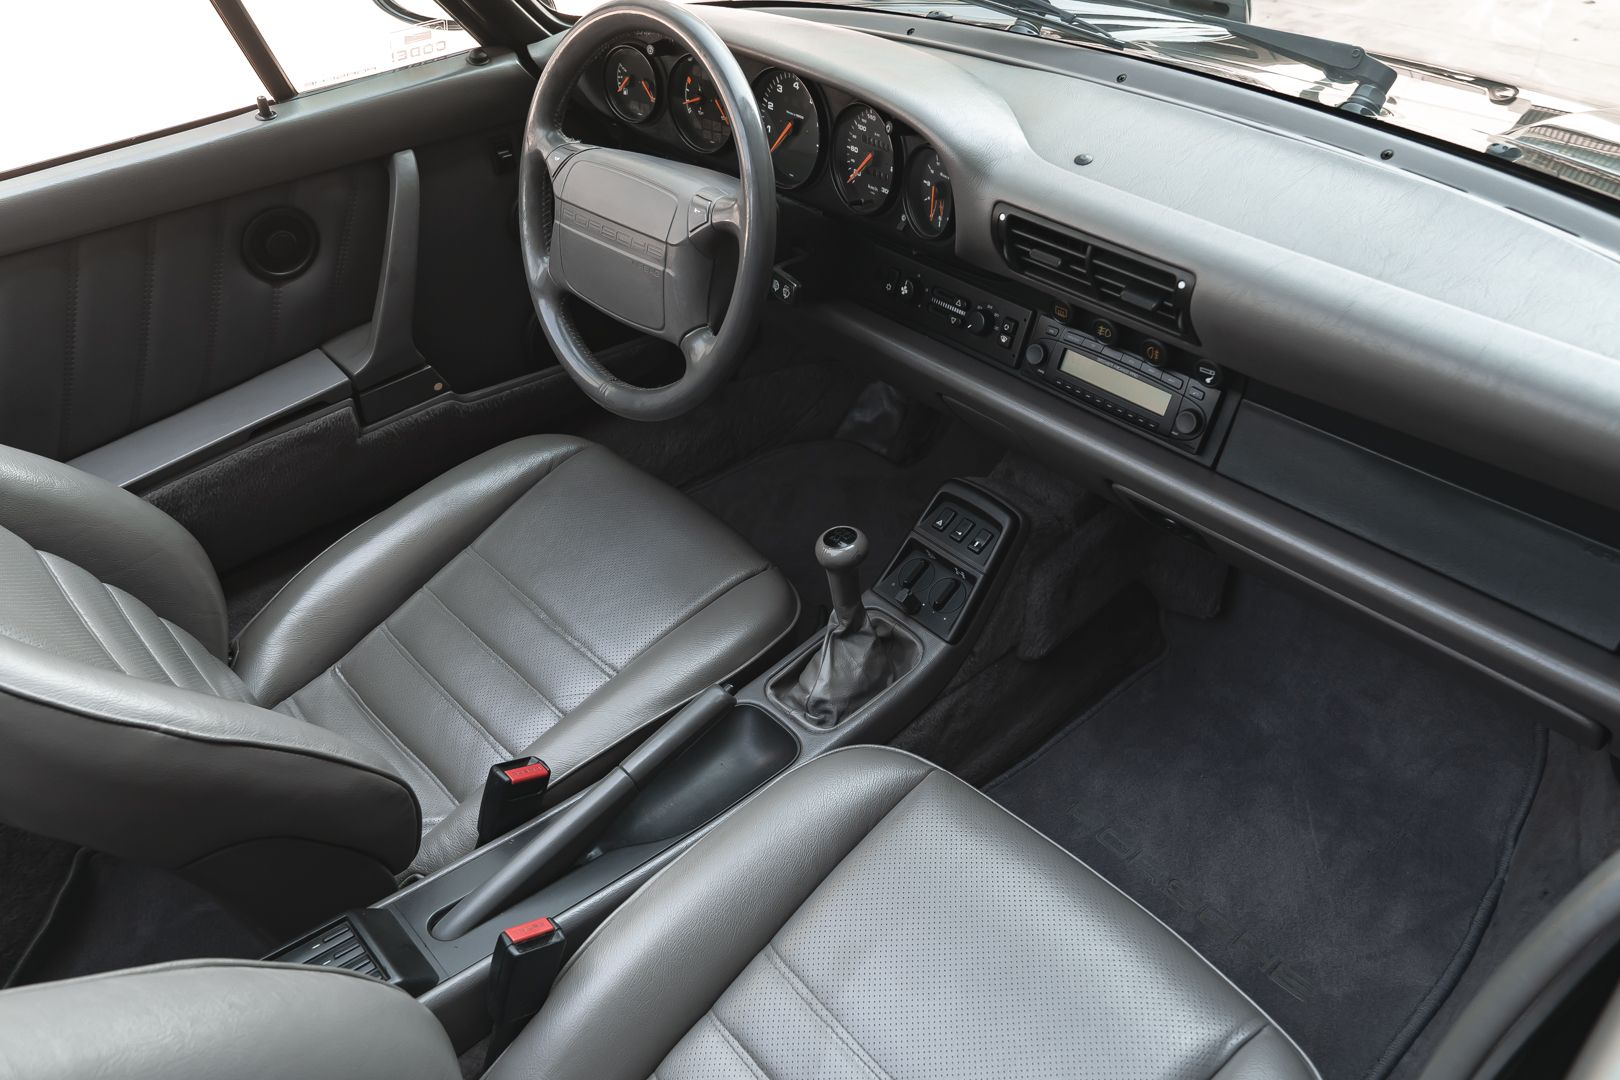 1991 Porsche 911/964 Carrera 4 79195